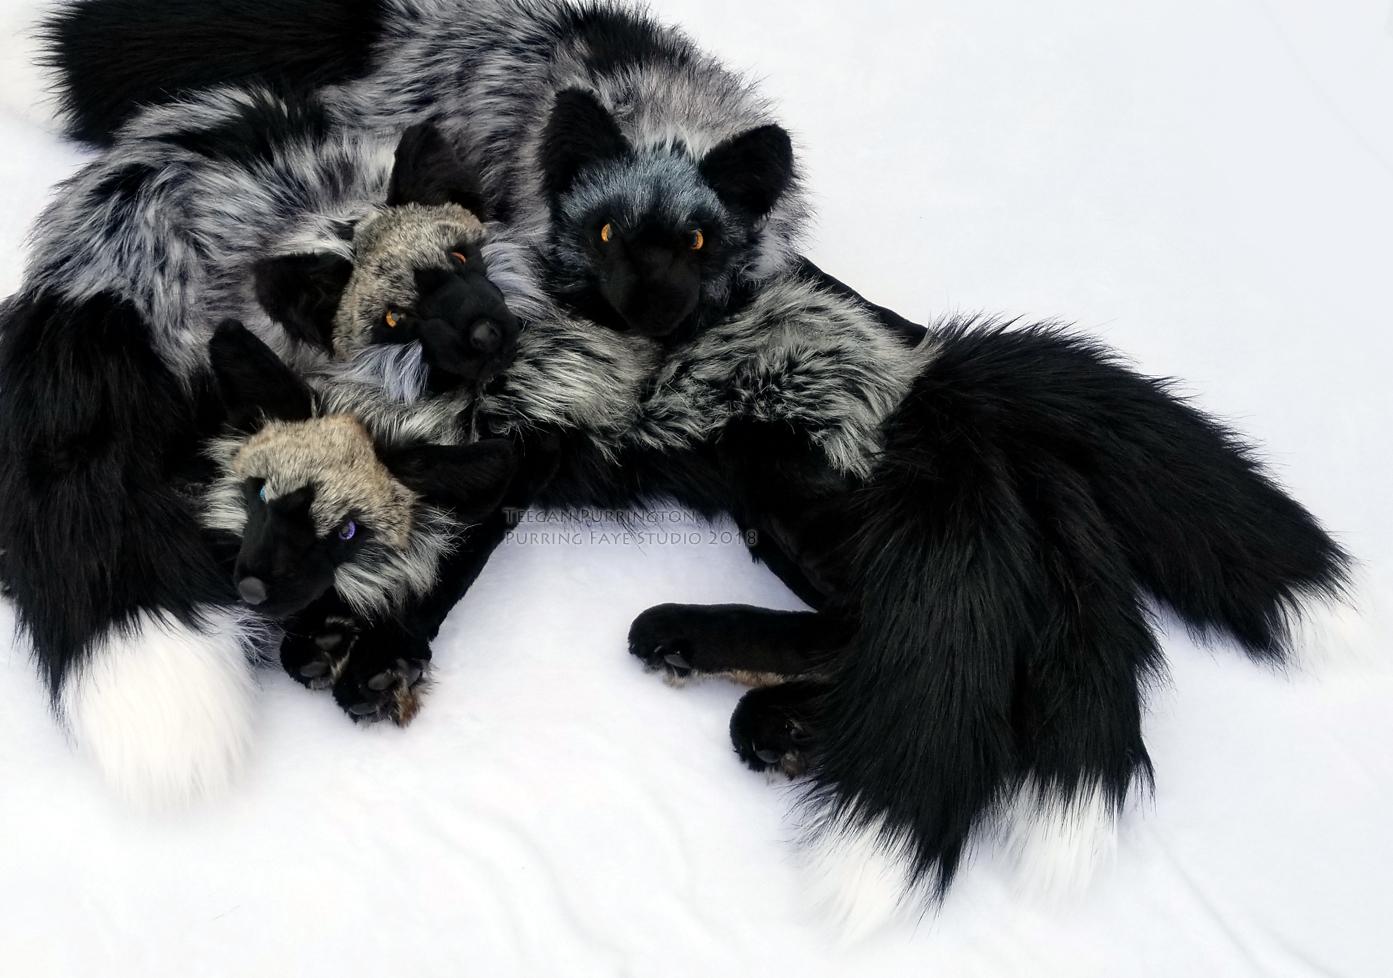 Silver Fox Stuffed Animal, Silver Fox Plushies By Teeganpurrington On Deviantart